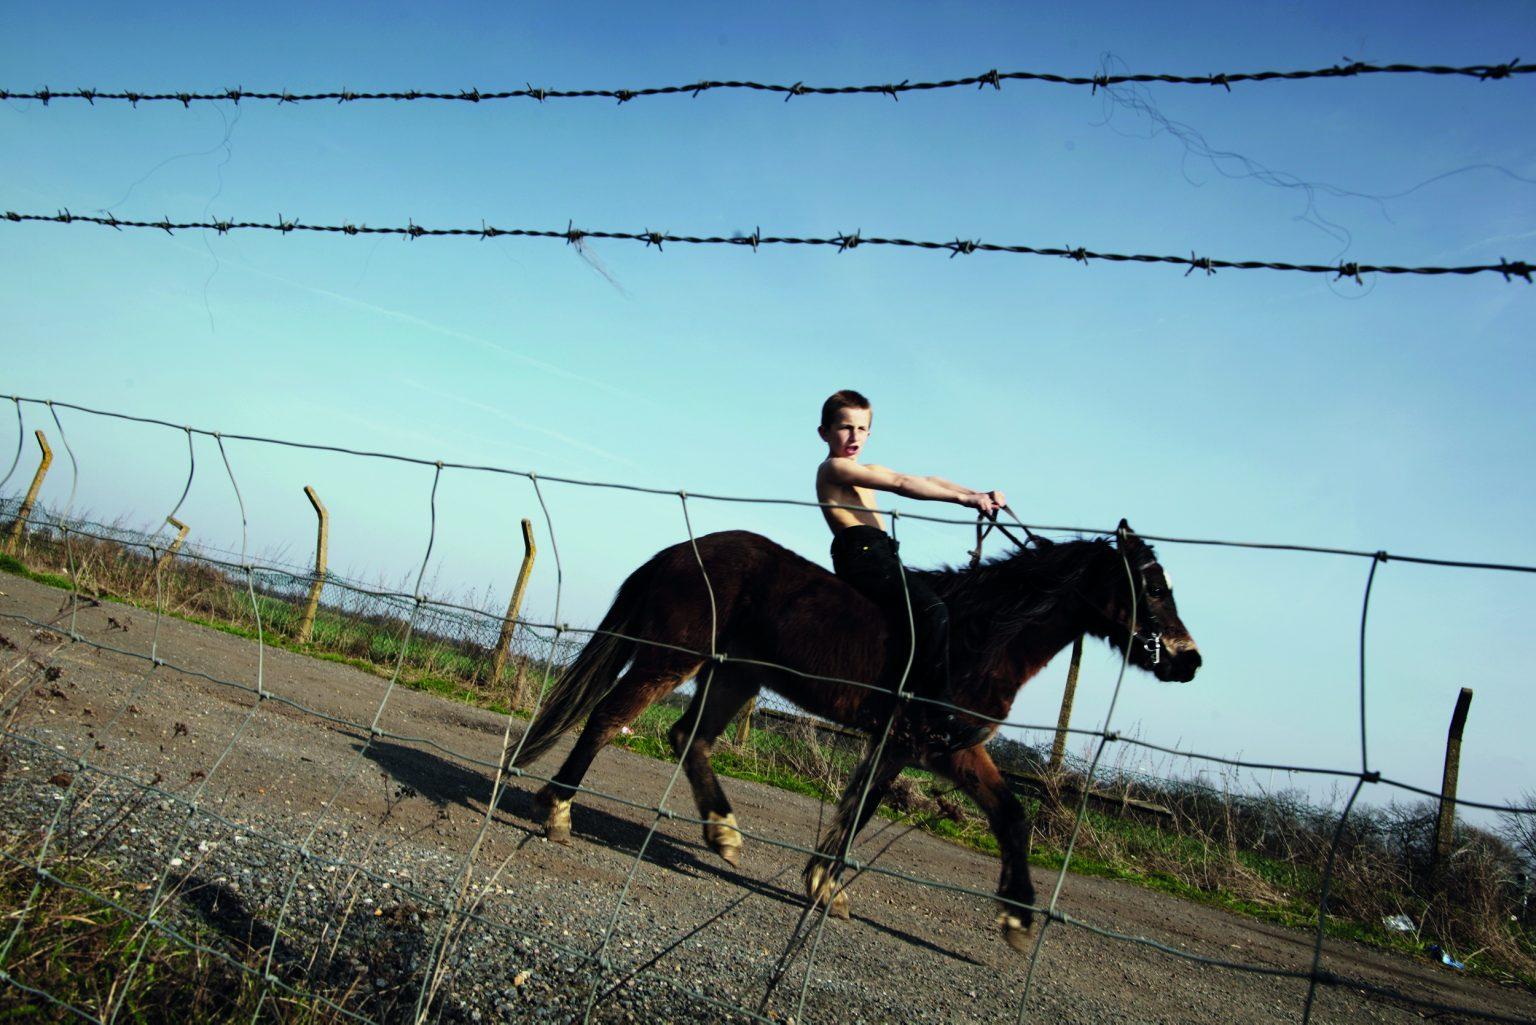 Appleby, United Kingdom, June 2012 - Appleby Horse Fair. A young gypsy jockey after winning a race. ><  Appleby, Regno Unito, giugno 2012 - Appleby Horse Fair. Un giovanissimo fantino gitano dopo aver vinto una gara. *** Local Caption ***